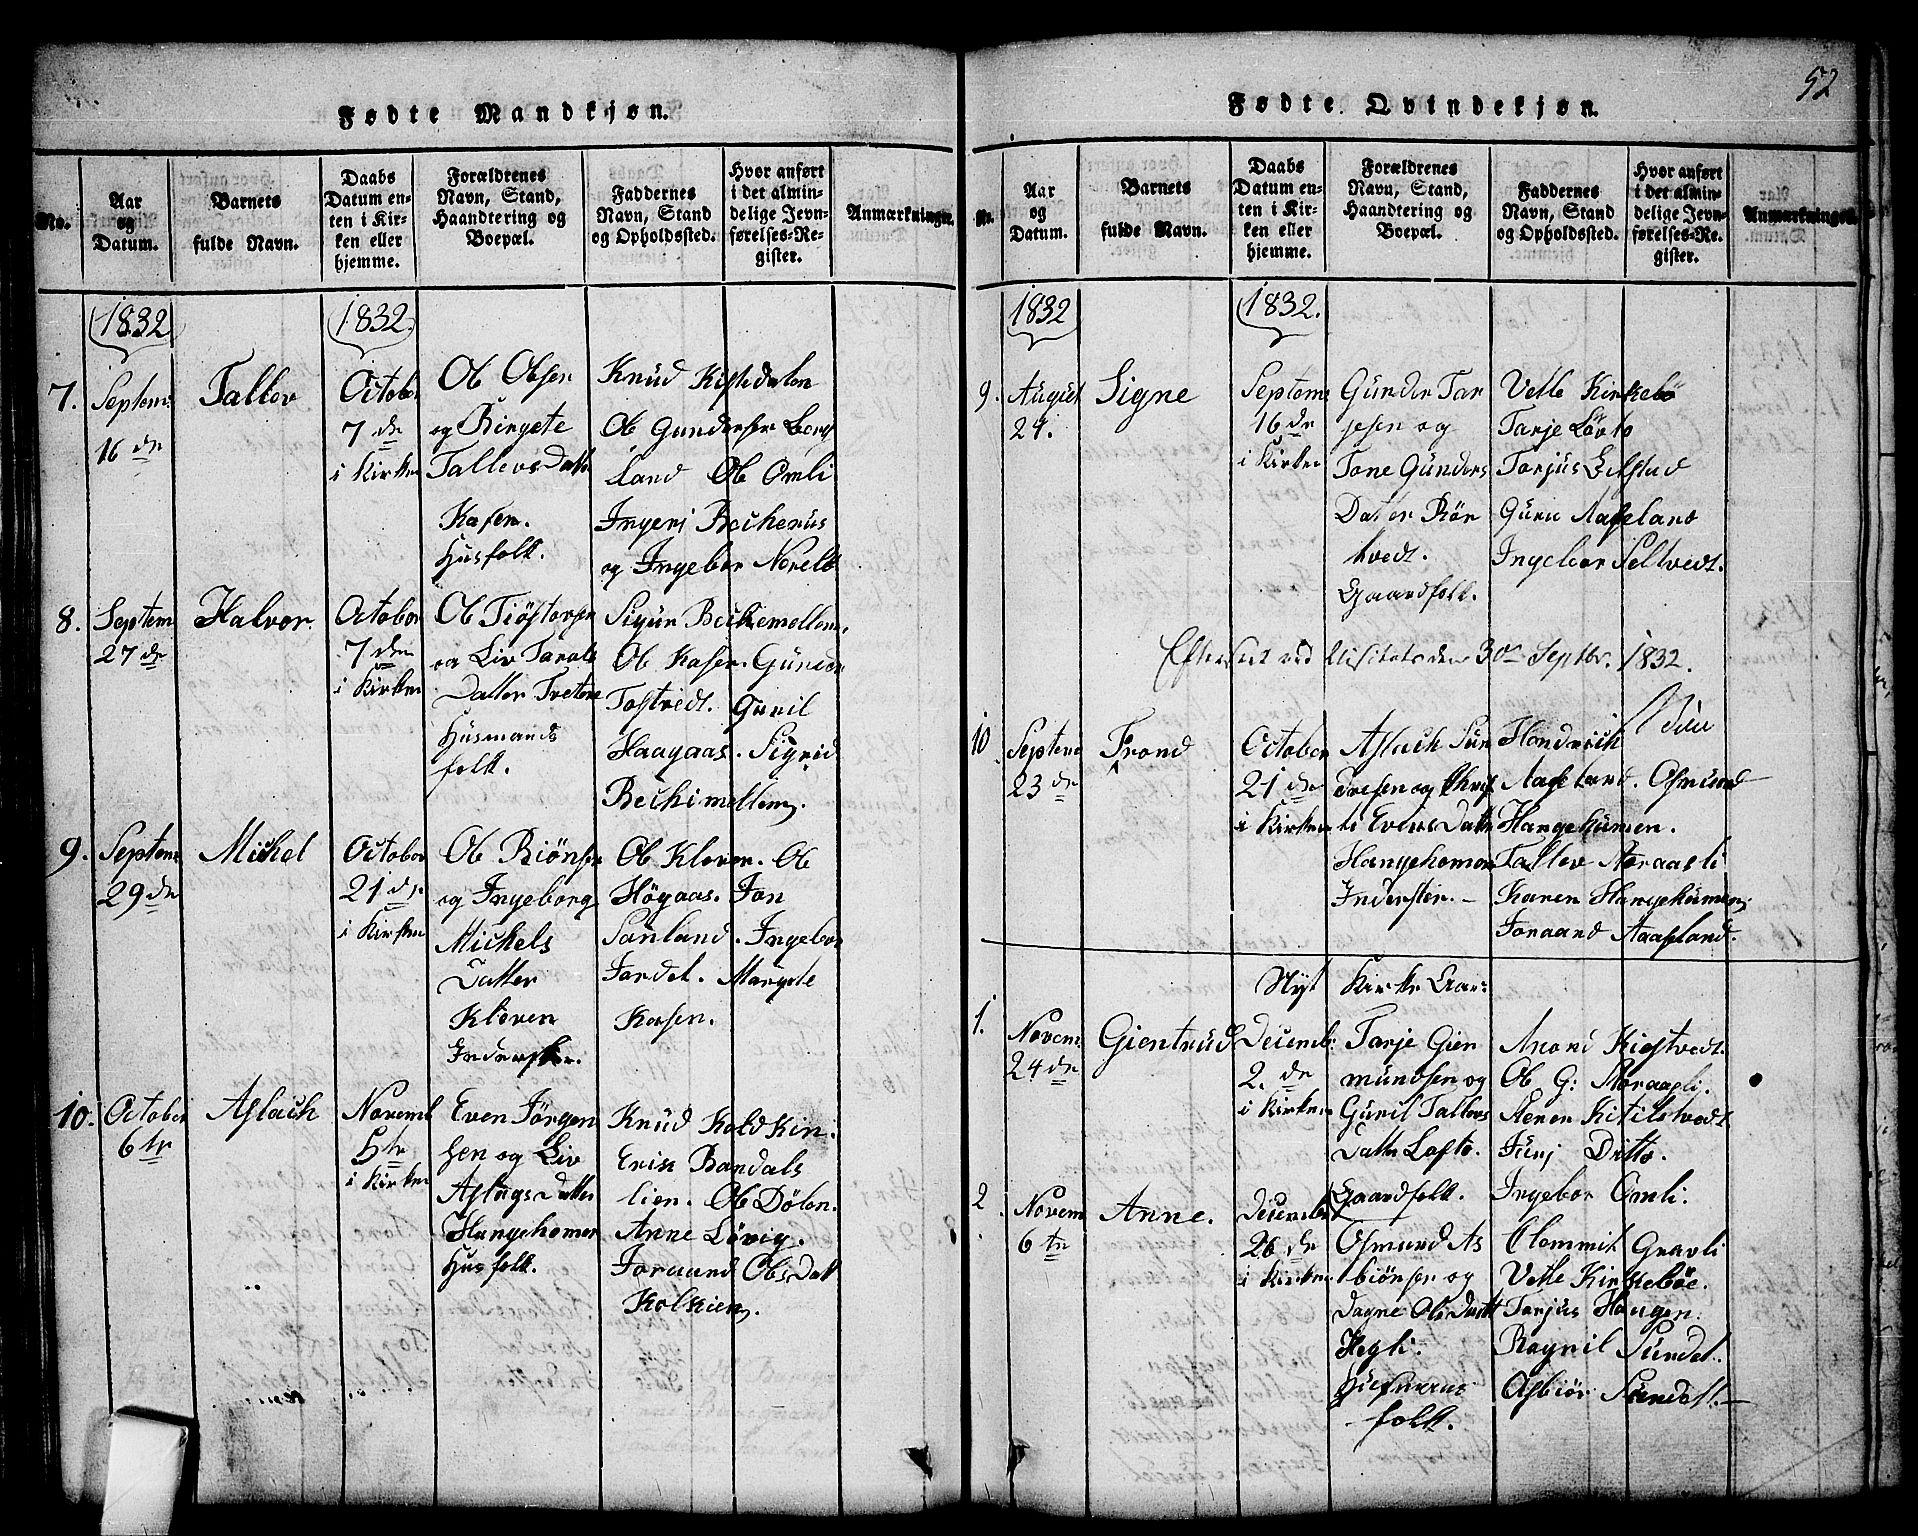 SAKO, Mo kirkebøker, G/Gb/L0001: Klokkerbok nr. II 1, 1814-1843, s. 52